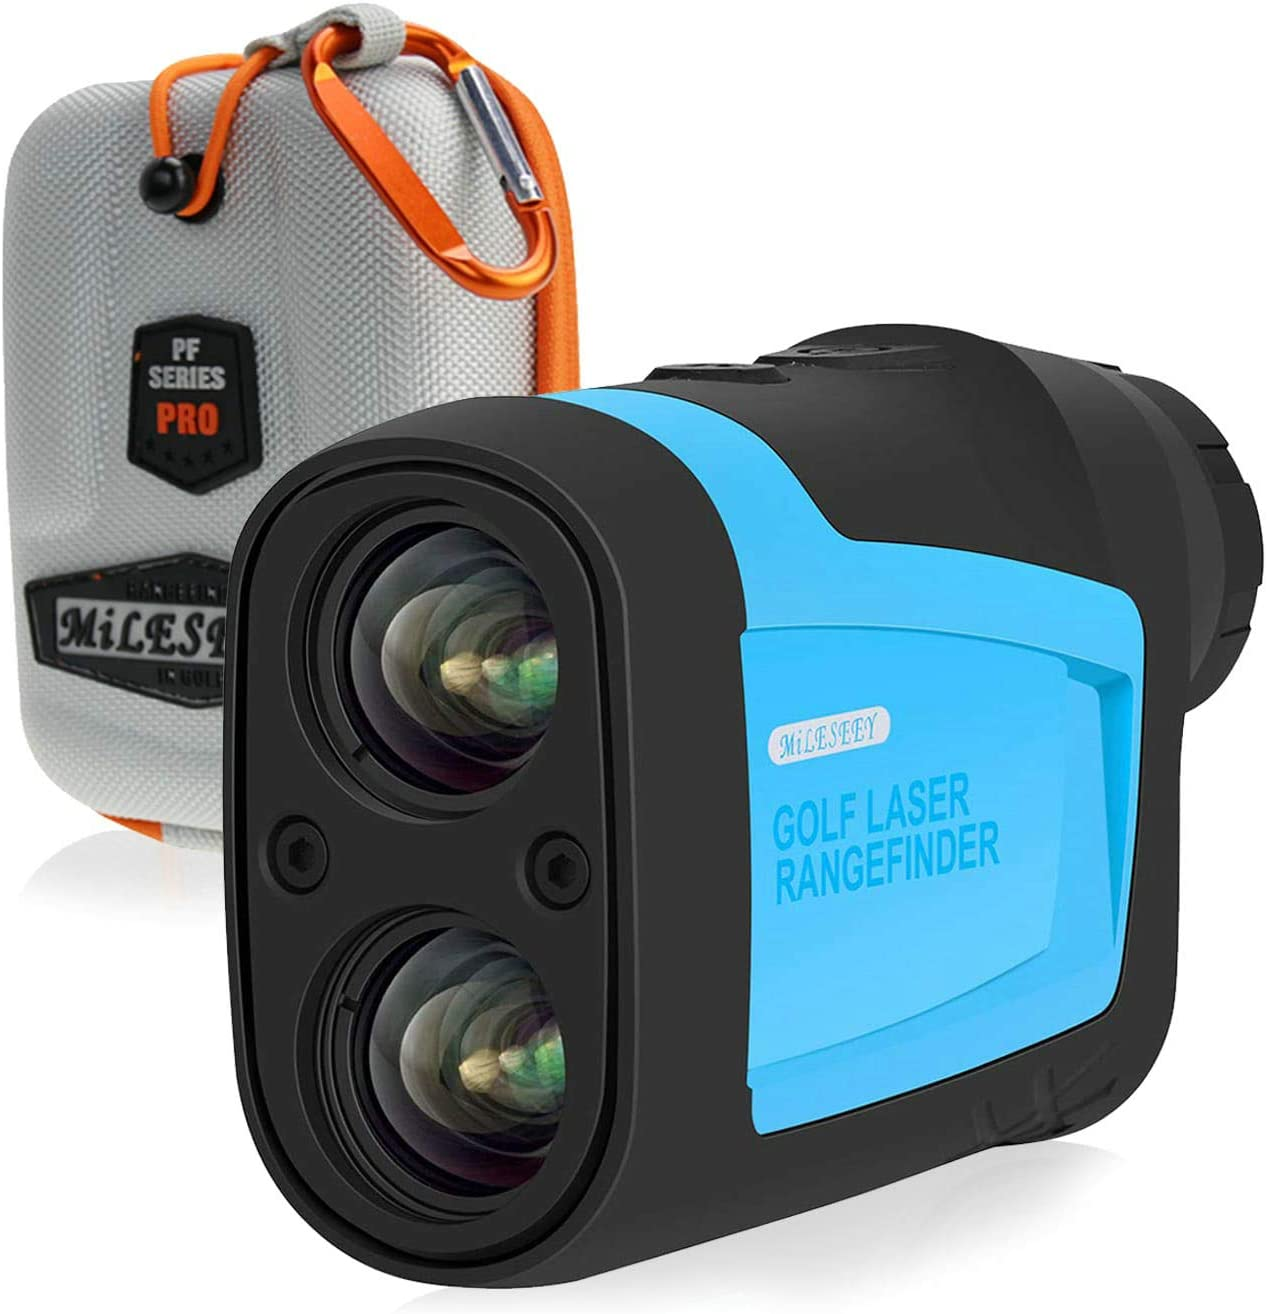 MiLESEEY Golf Rangefinder Laser Binoculars 660 Yard 6X Magnification with Slope Pin Scanning Model for Golf Training